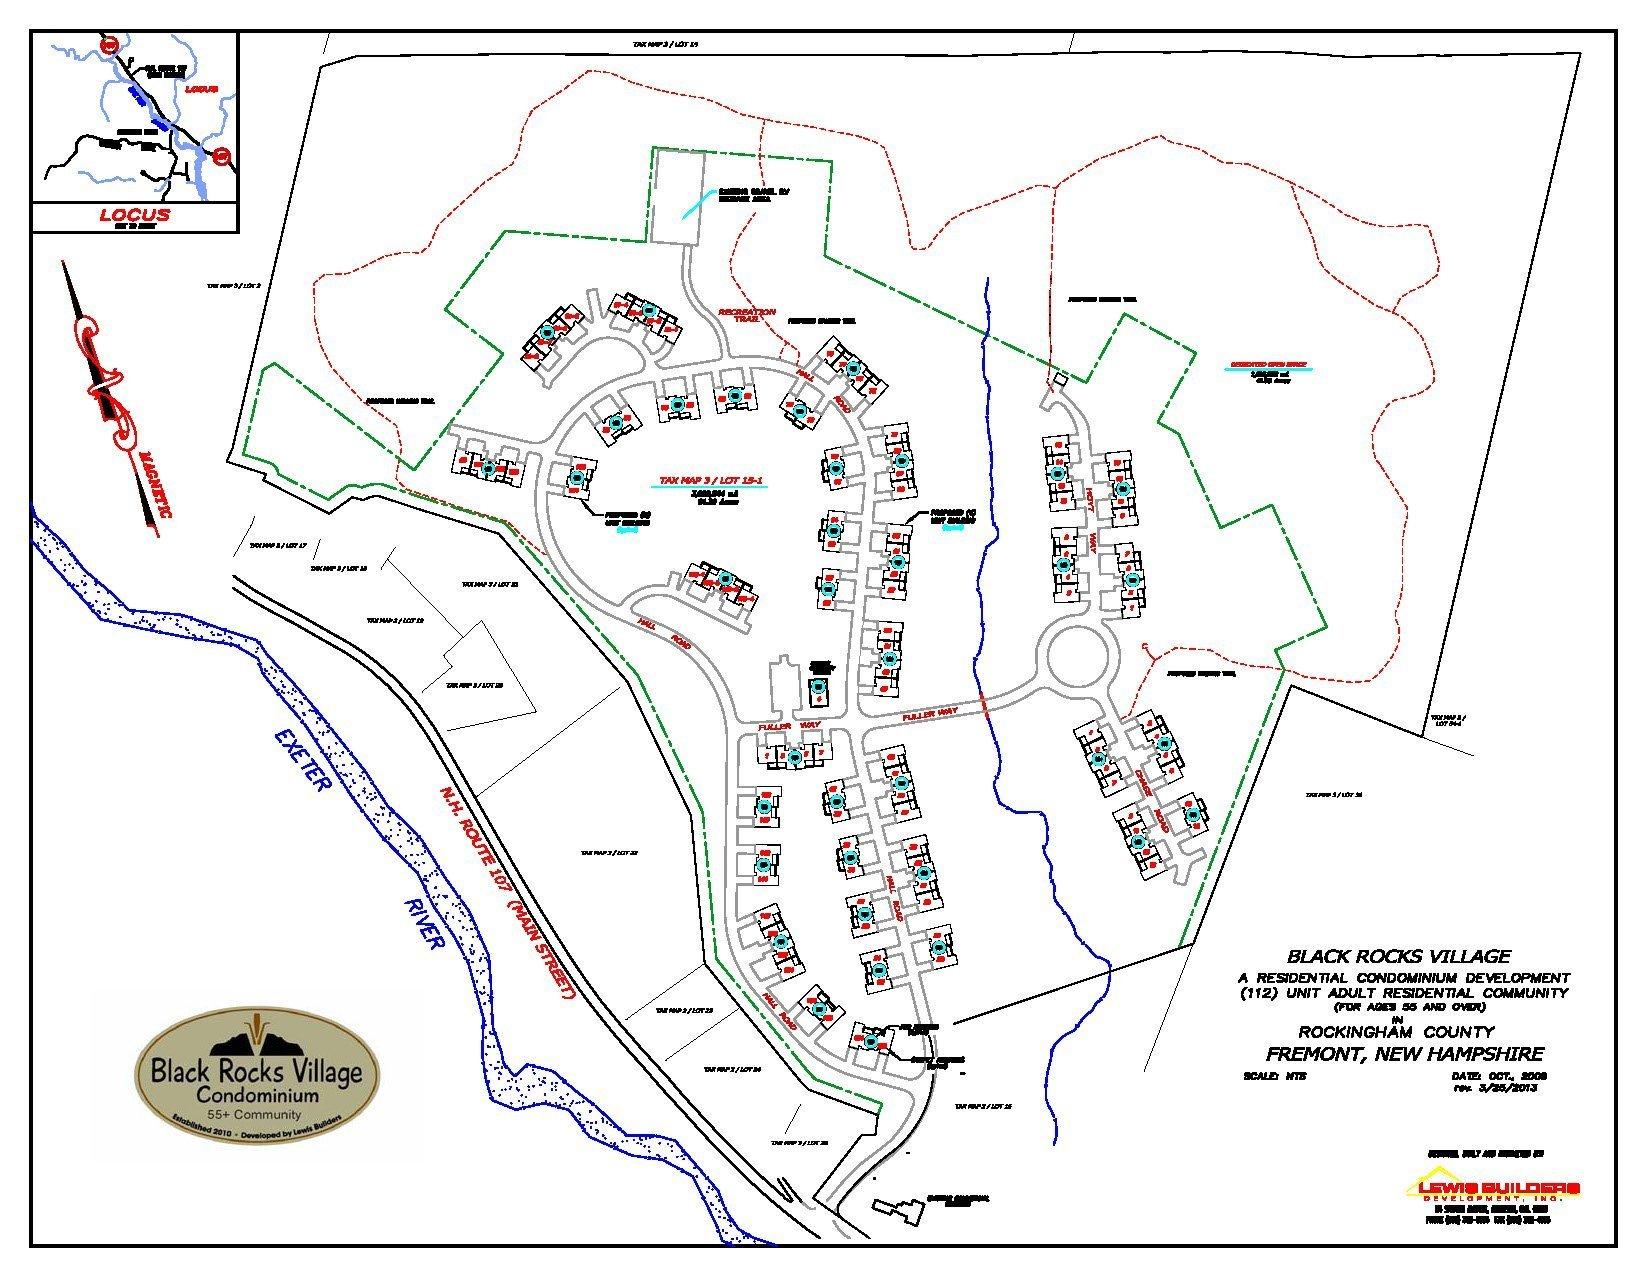 New Homes Site Plan for Black Rocks Village in Fremont NH